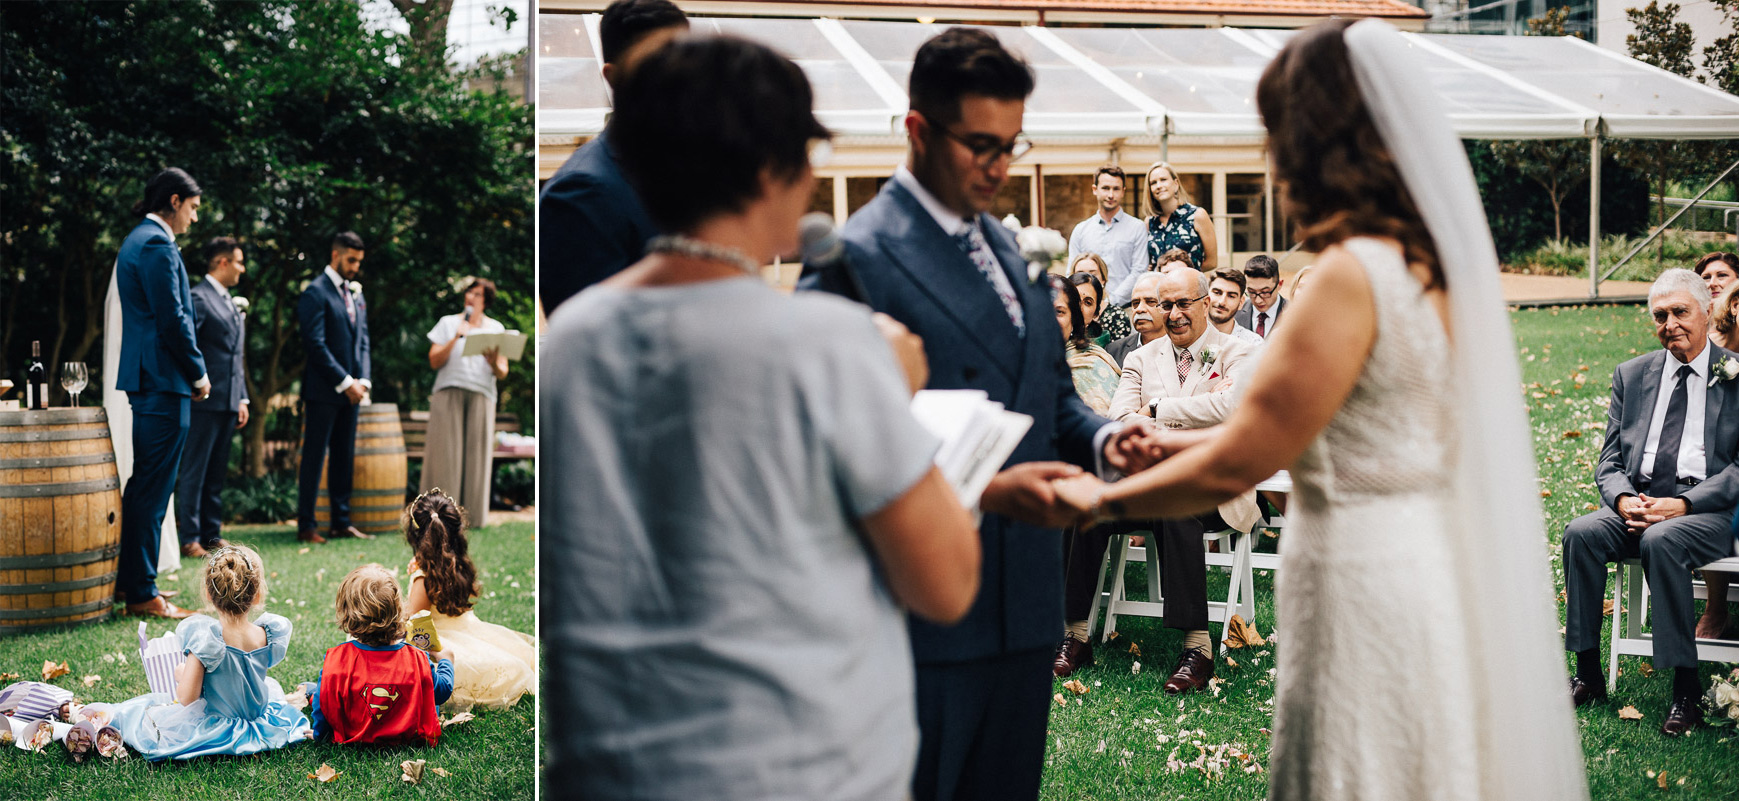 super-fun-bishops-house-wedding-56.jpg